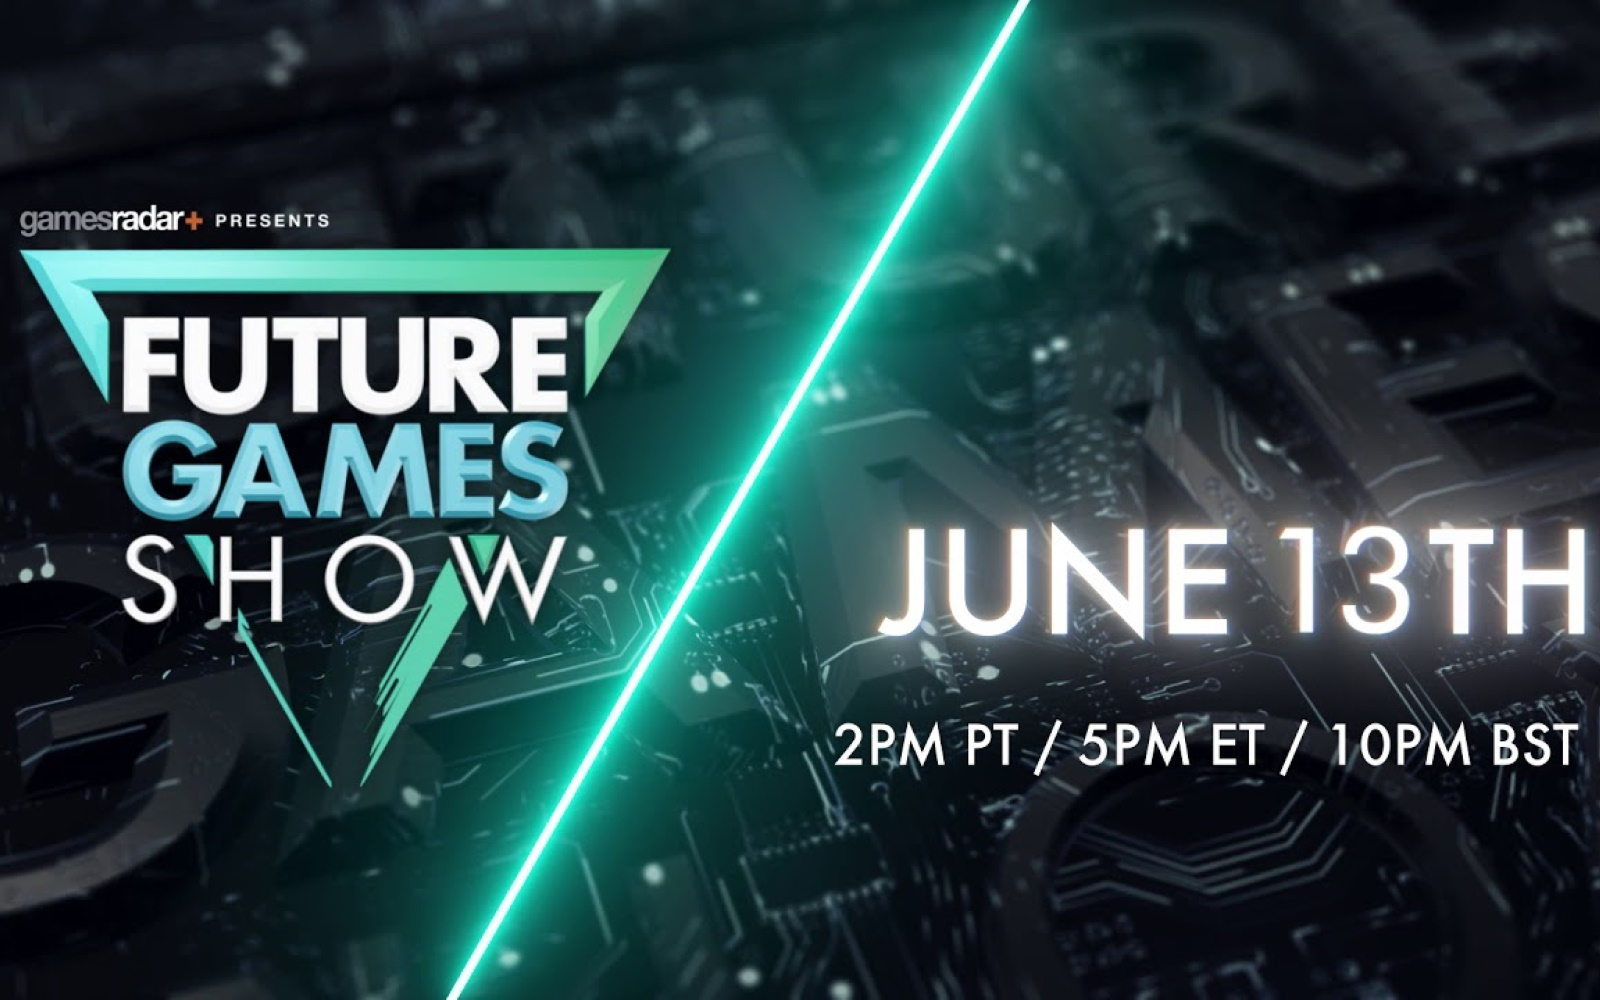 GamesRadar+ Future Games Show Streams This Weekend